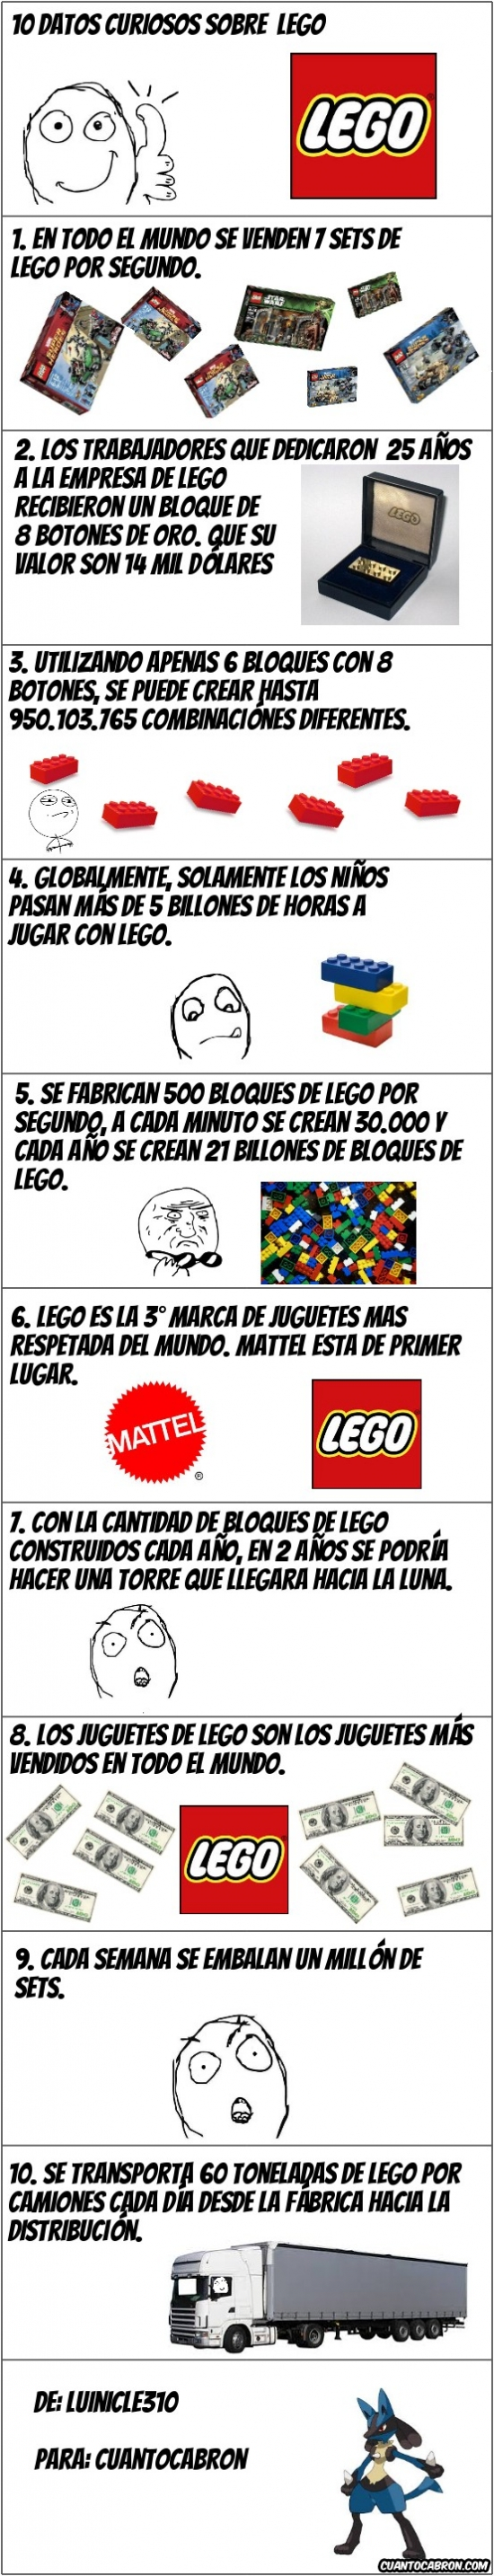 Mix - Curiosidades de Lego